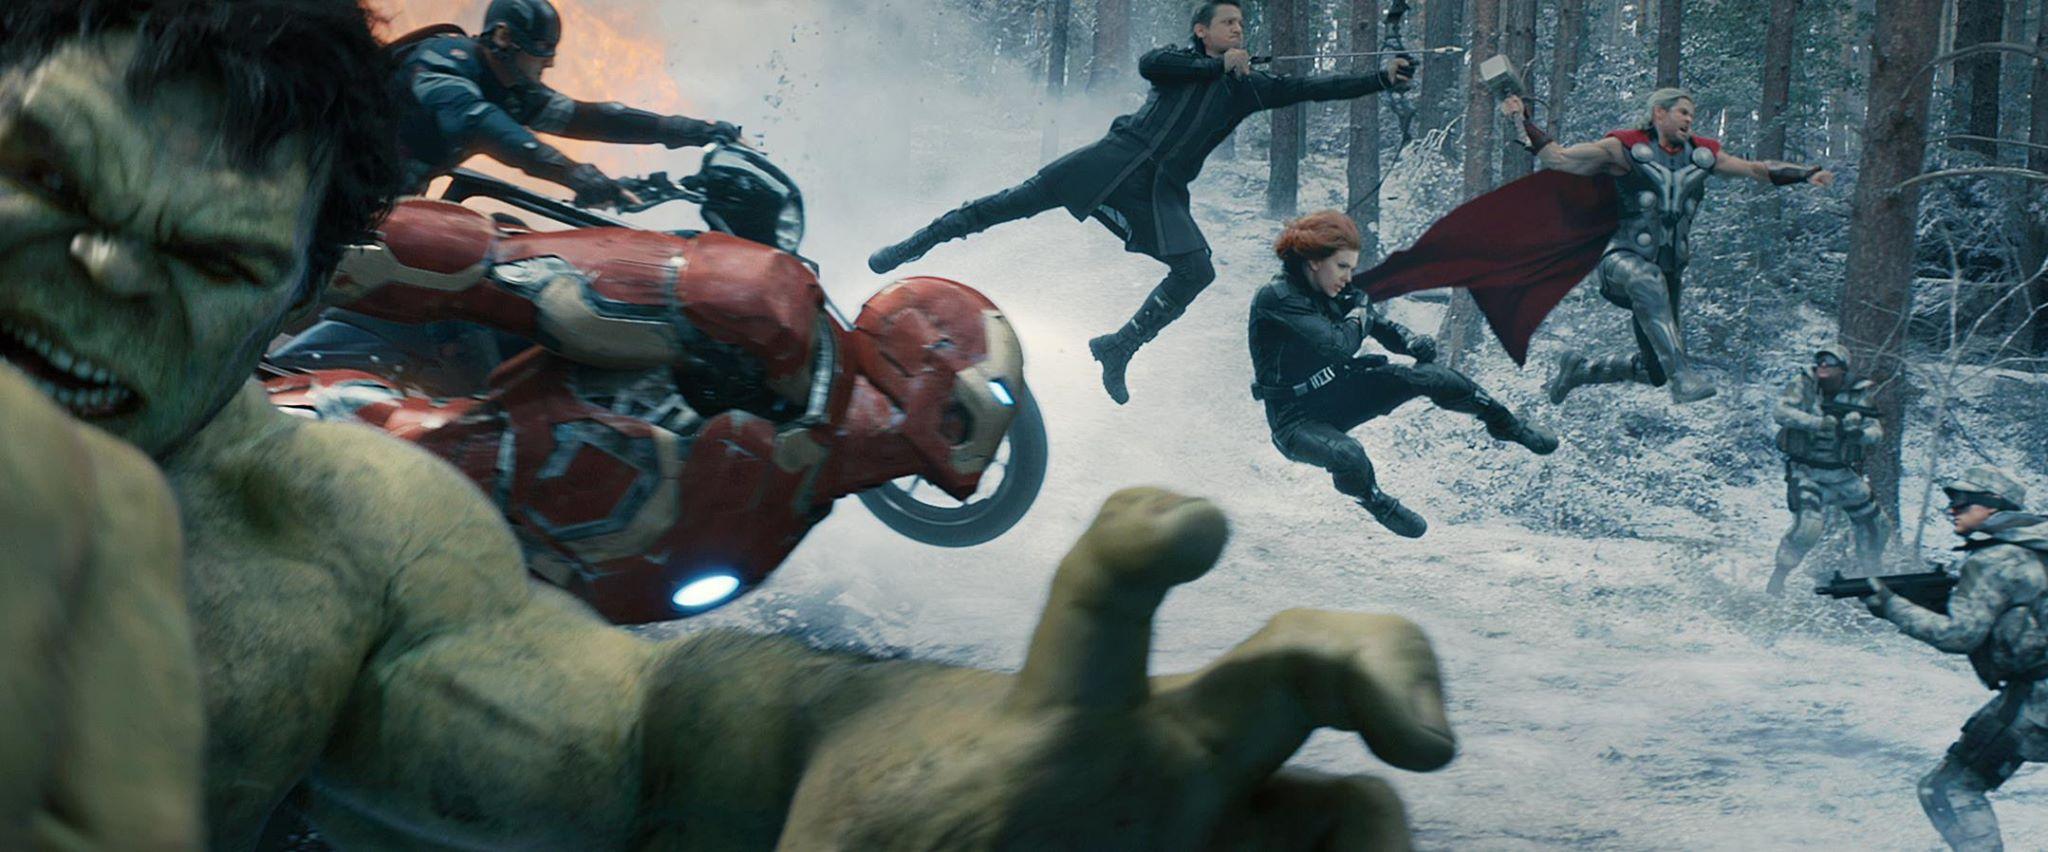 Avengers 攻擊 Hydra 一處位於 Sokovia 的秘密研究所